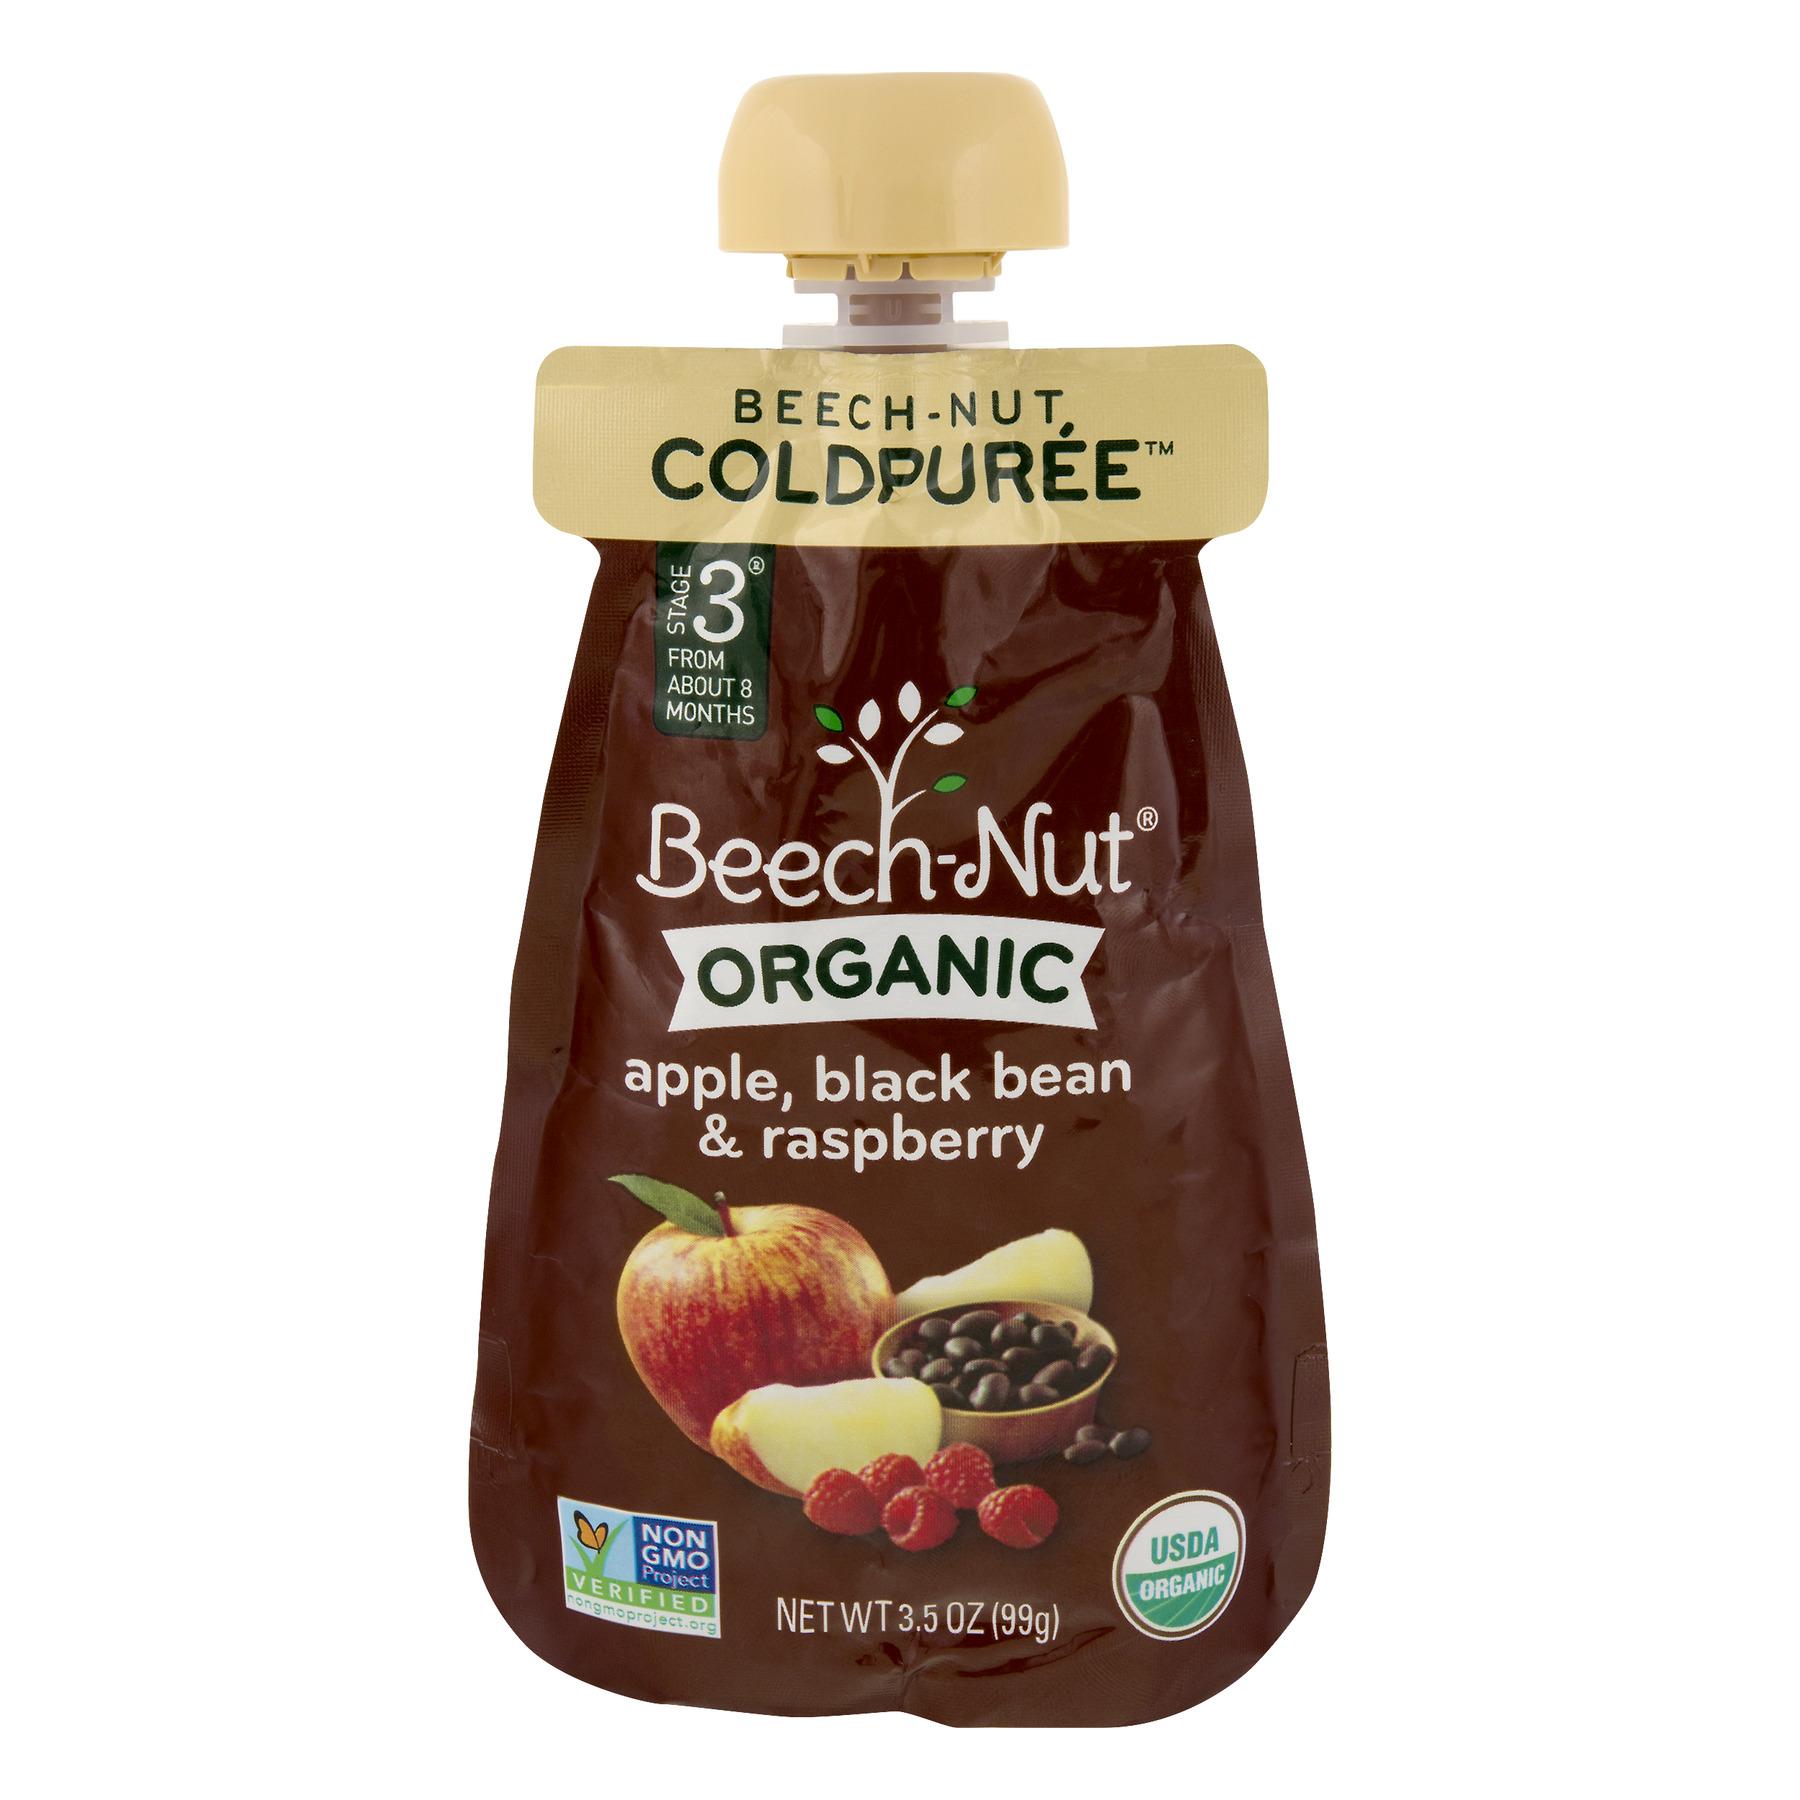 Beech-Nut Organic Stage 3 Apple, Black Bean & Raspberry, 3.5 oz Pouch